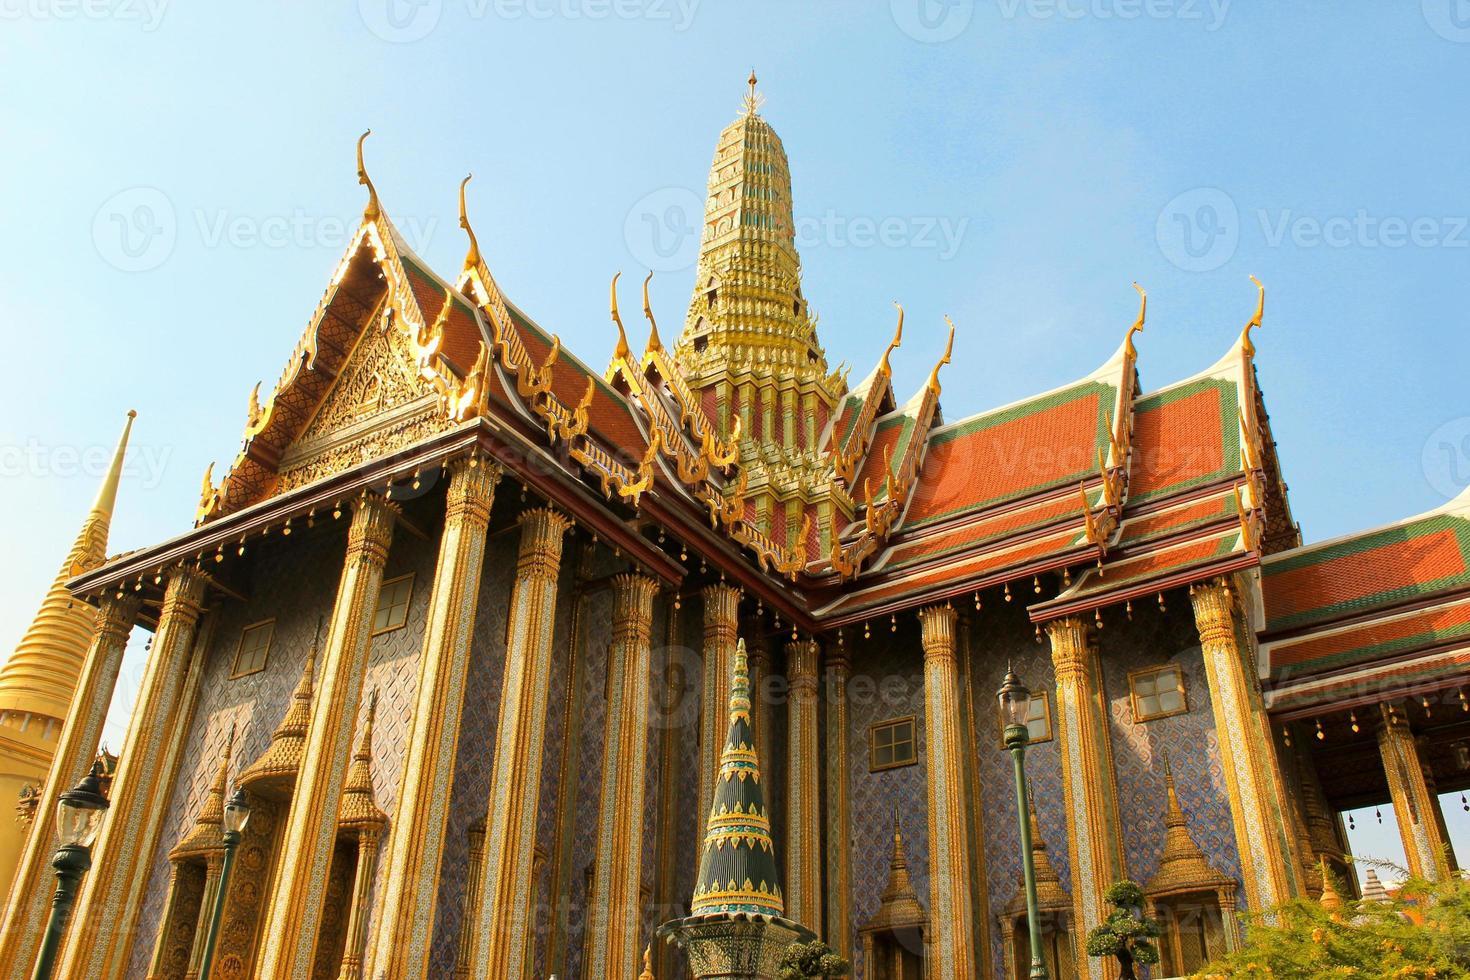 det berömda stora palatset i Bangkok Thailand foto